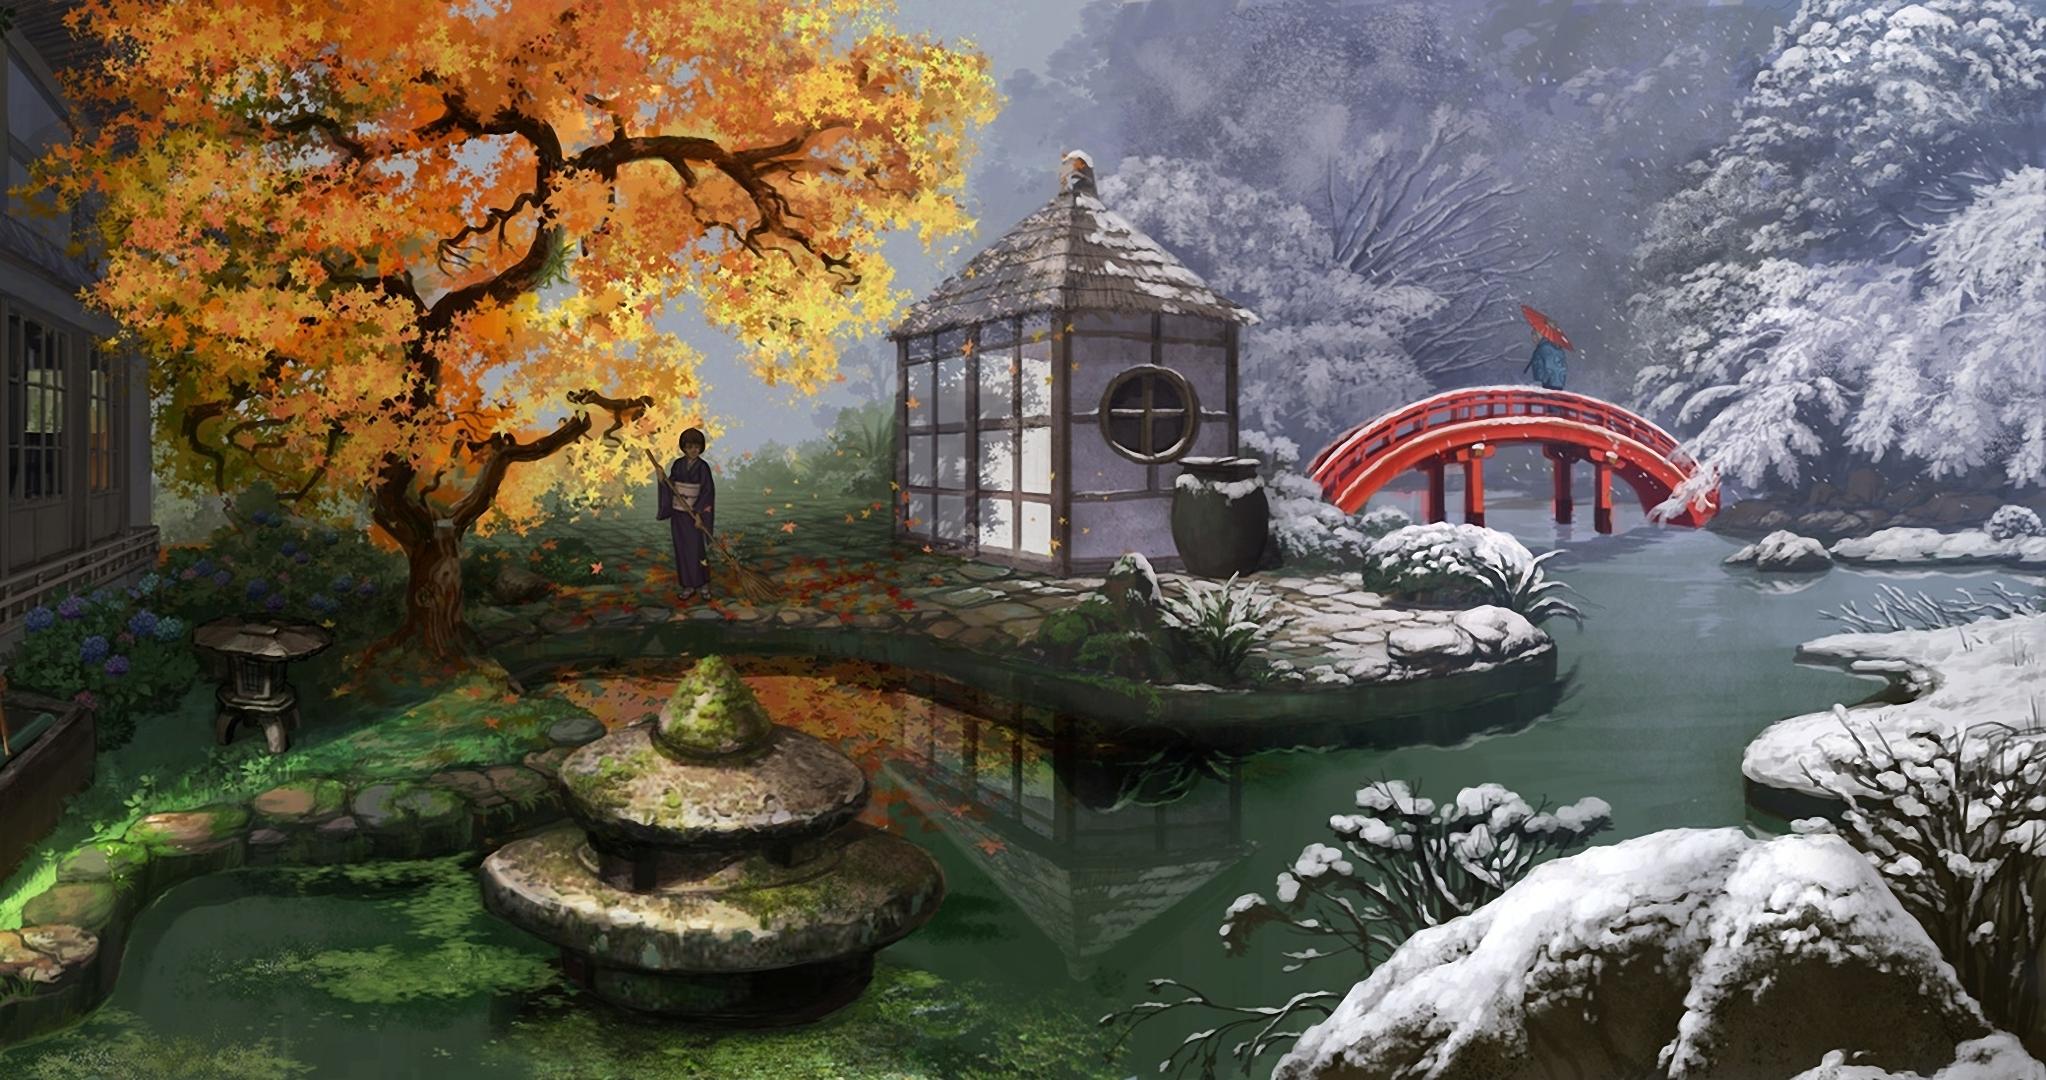 http://img2.goodfon.ru/original/2046x1080/0/82/art-mugon-devushki-osen-zima.jpg